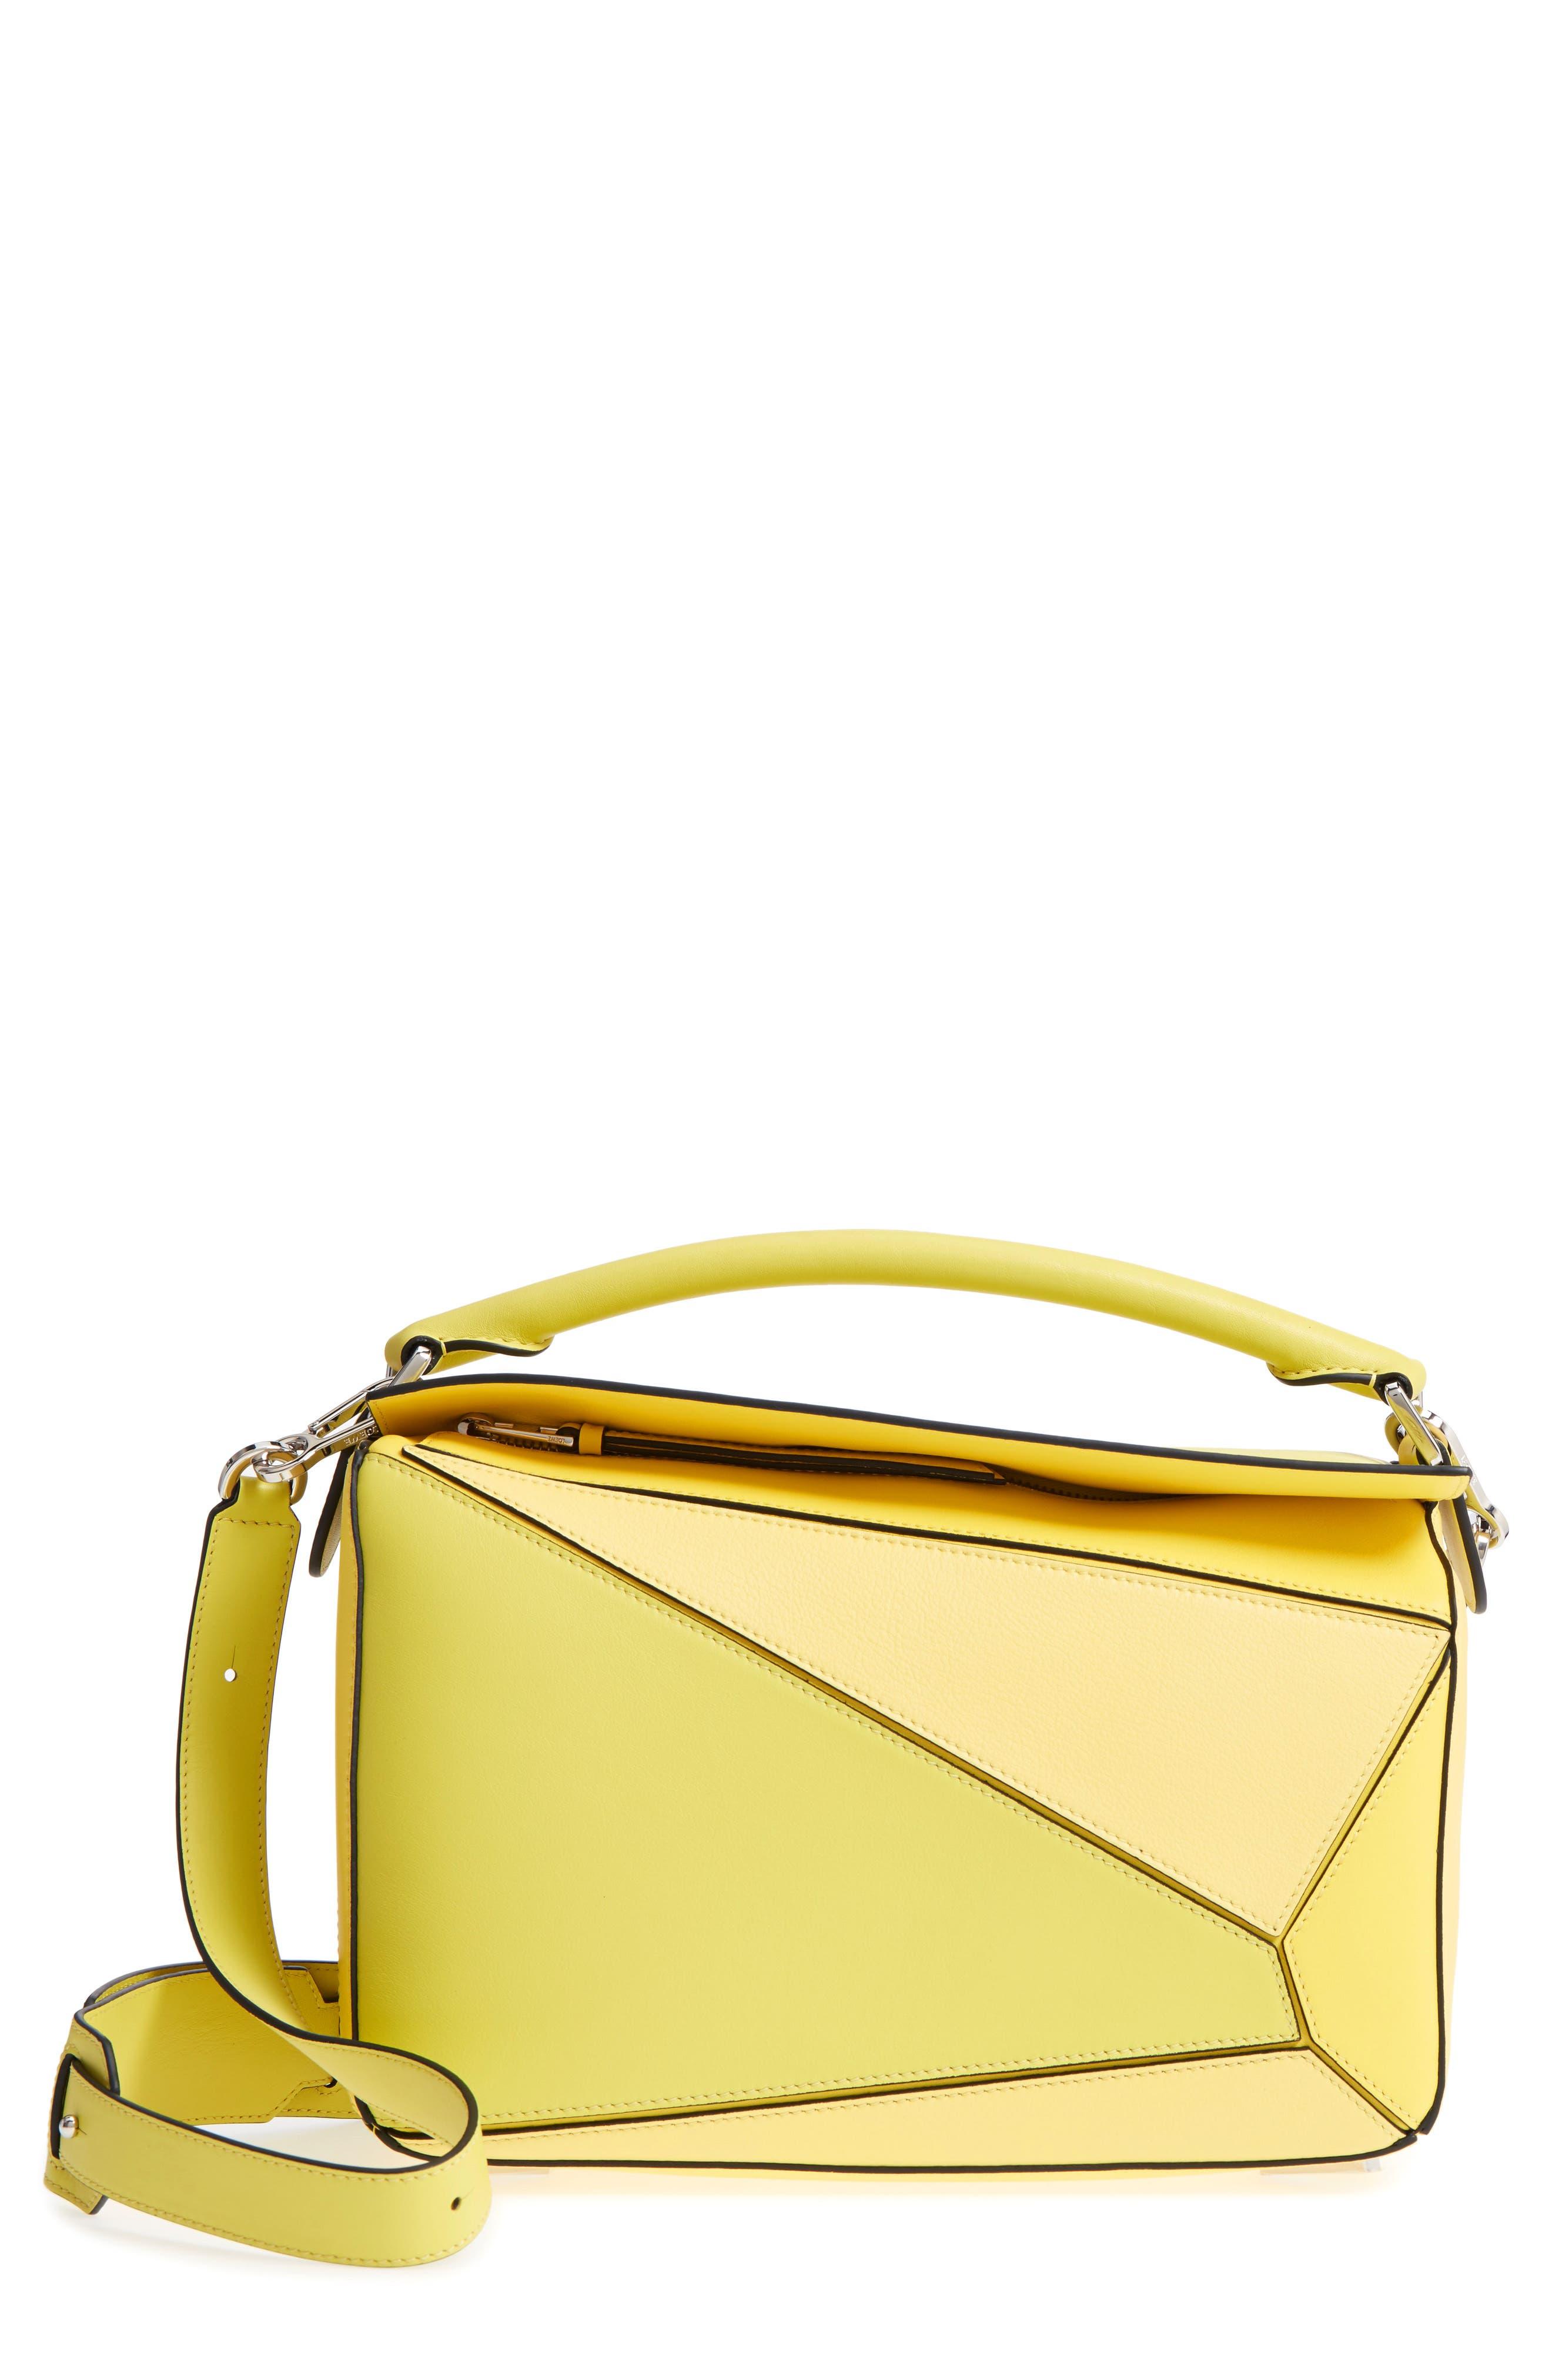 Medium Puzzle Calfskin Leather Shoulder Bag,                             Main thumbnail 1, color,                             Yellow Multitone